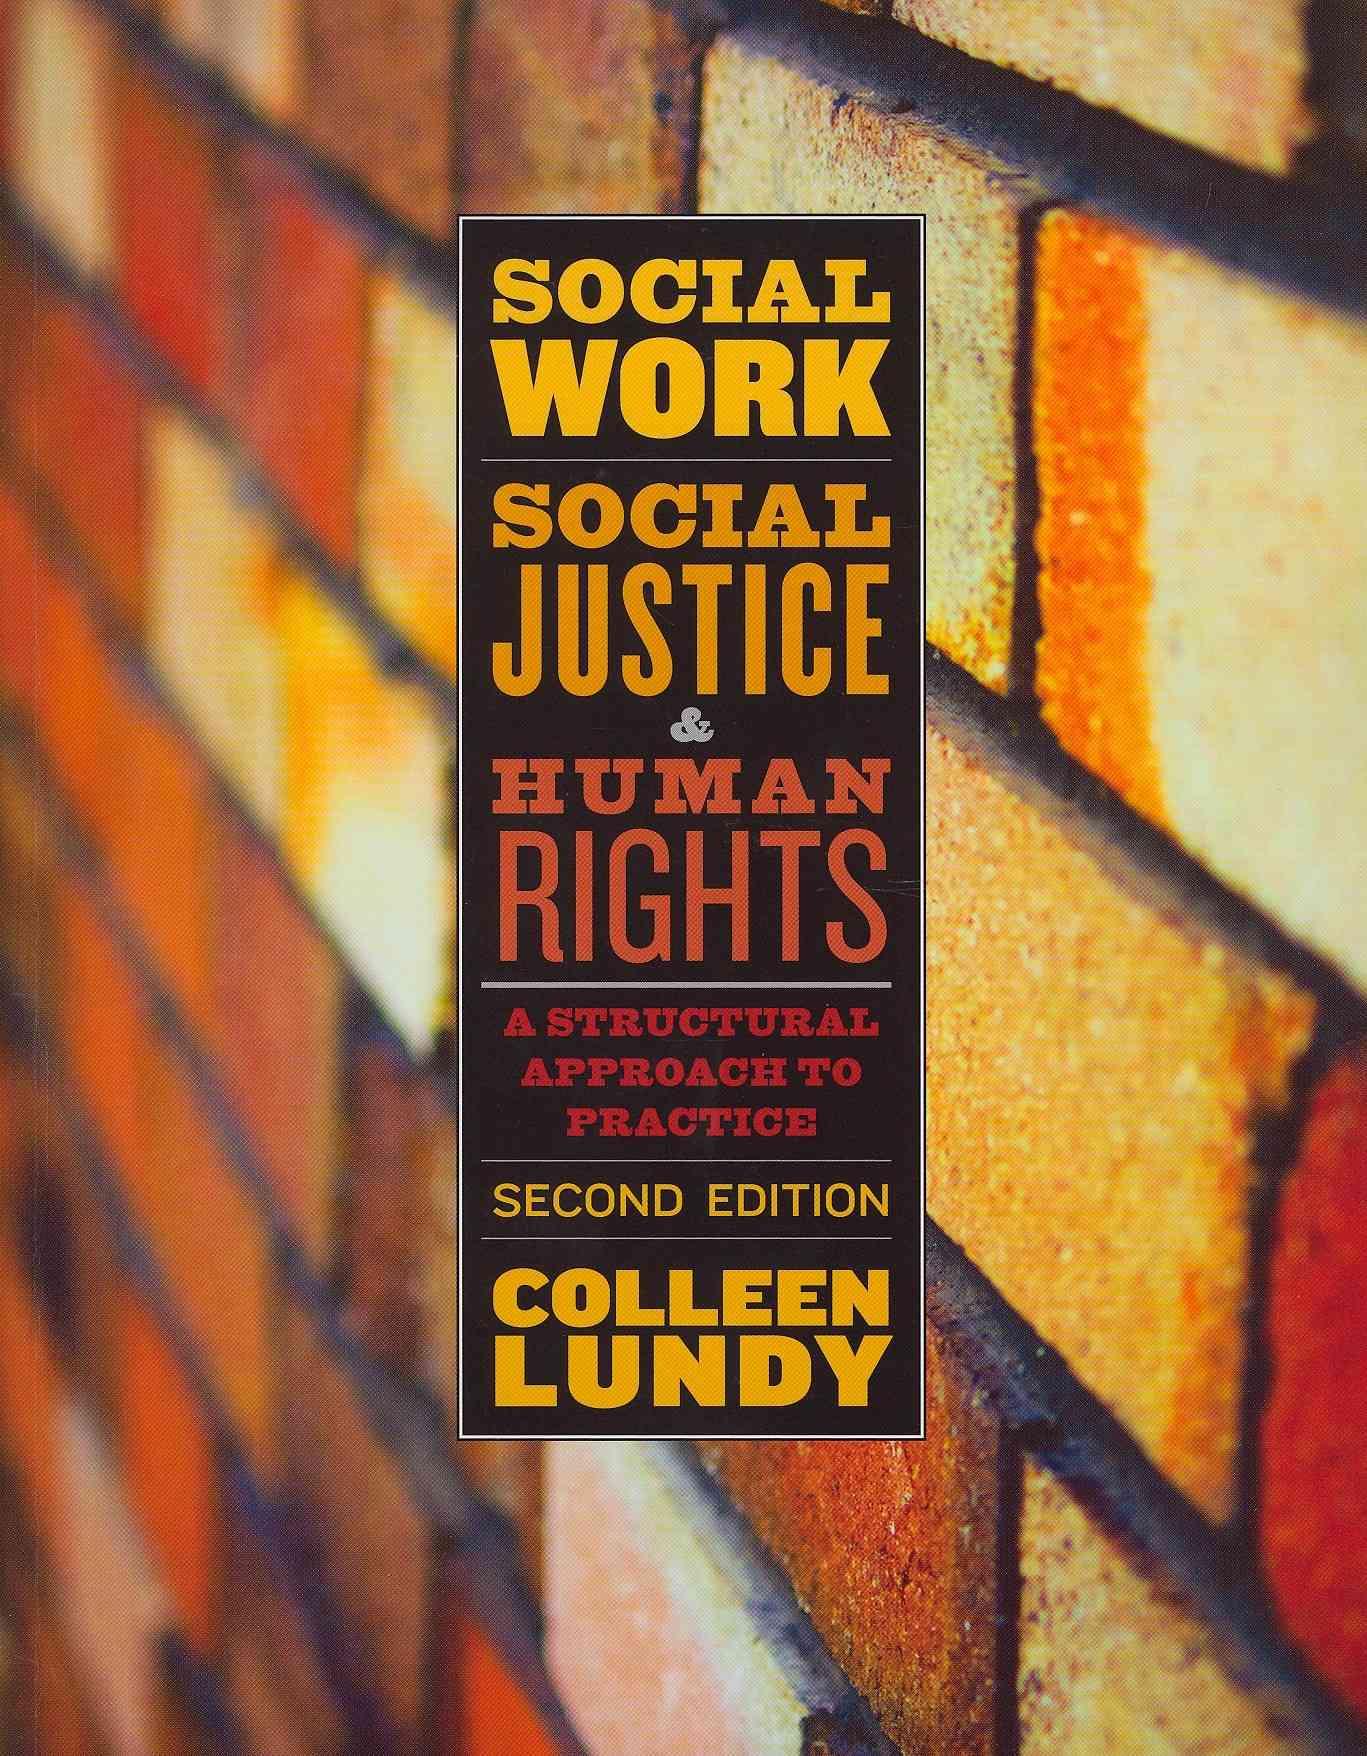 Social Work, Social Justice, and Human Rights